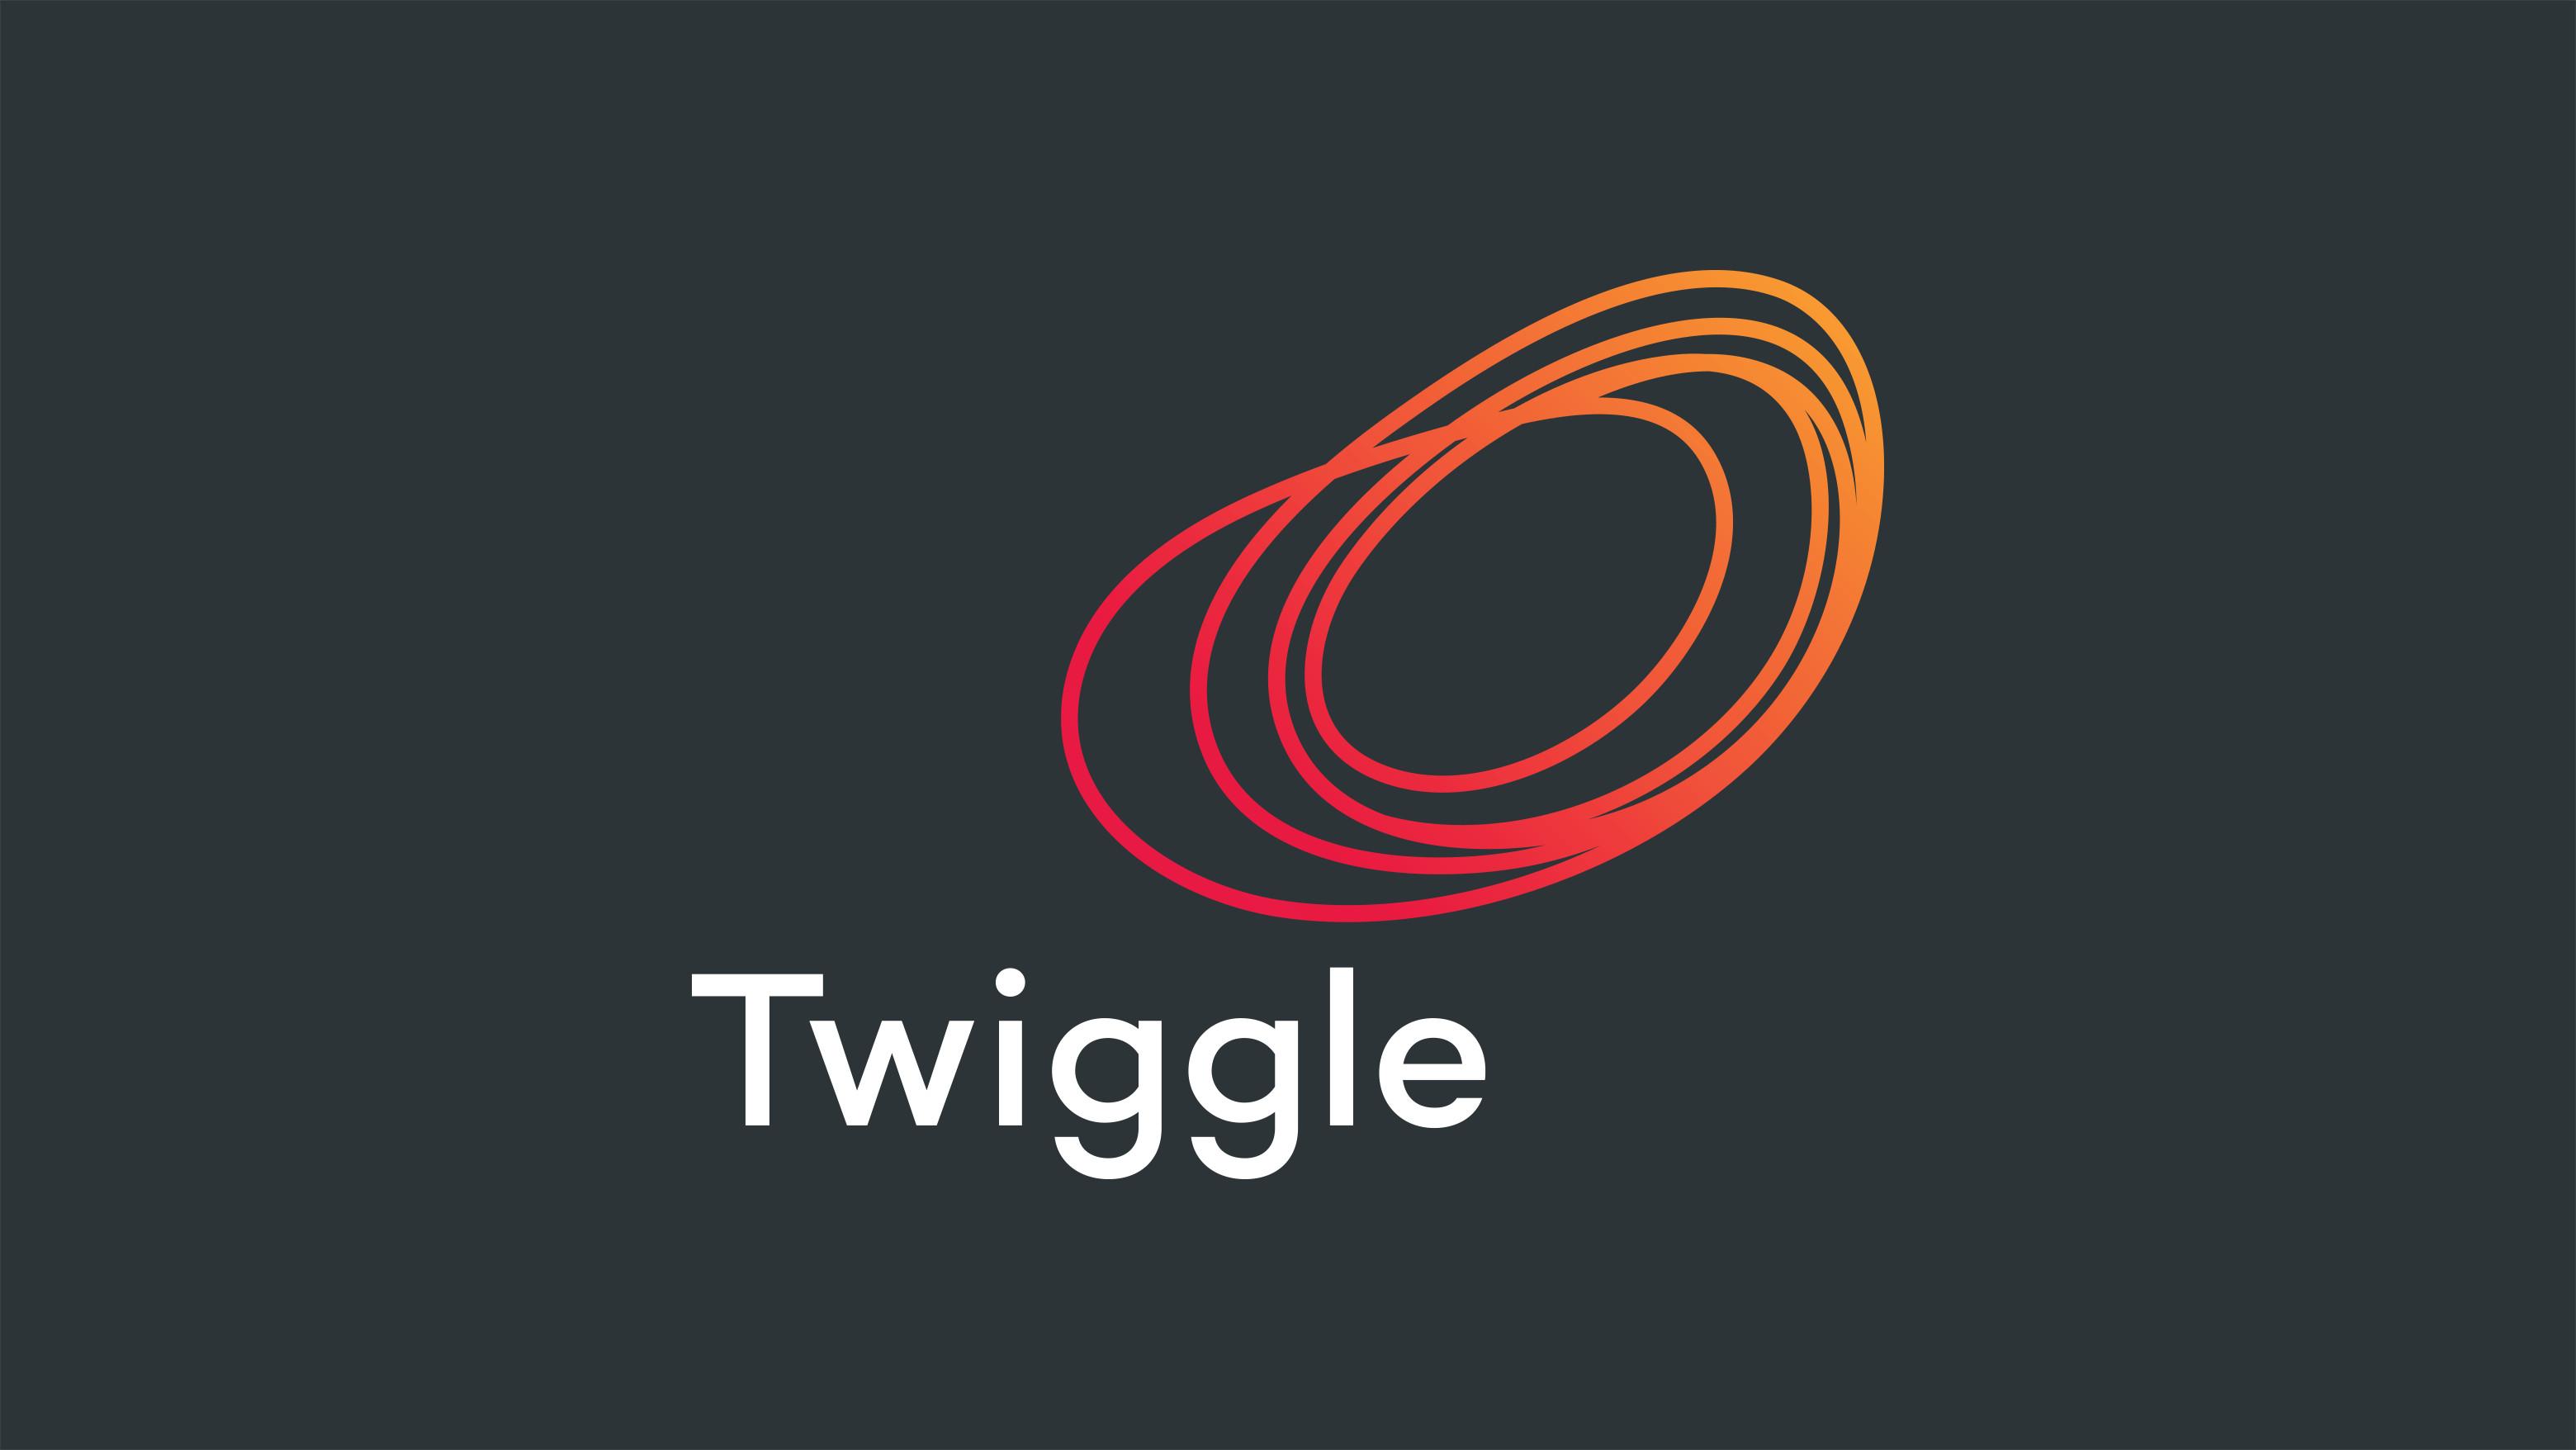 branding twiggle logo